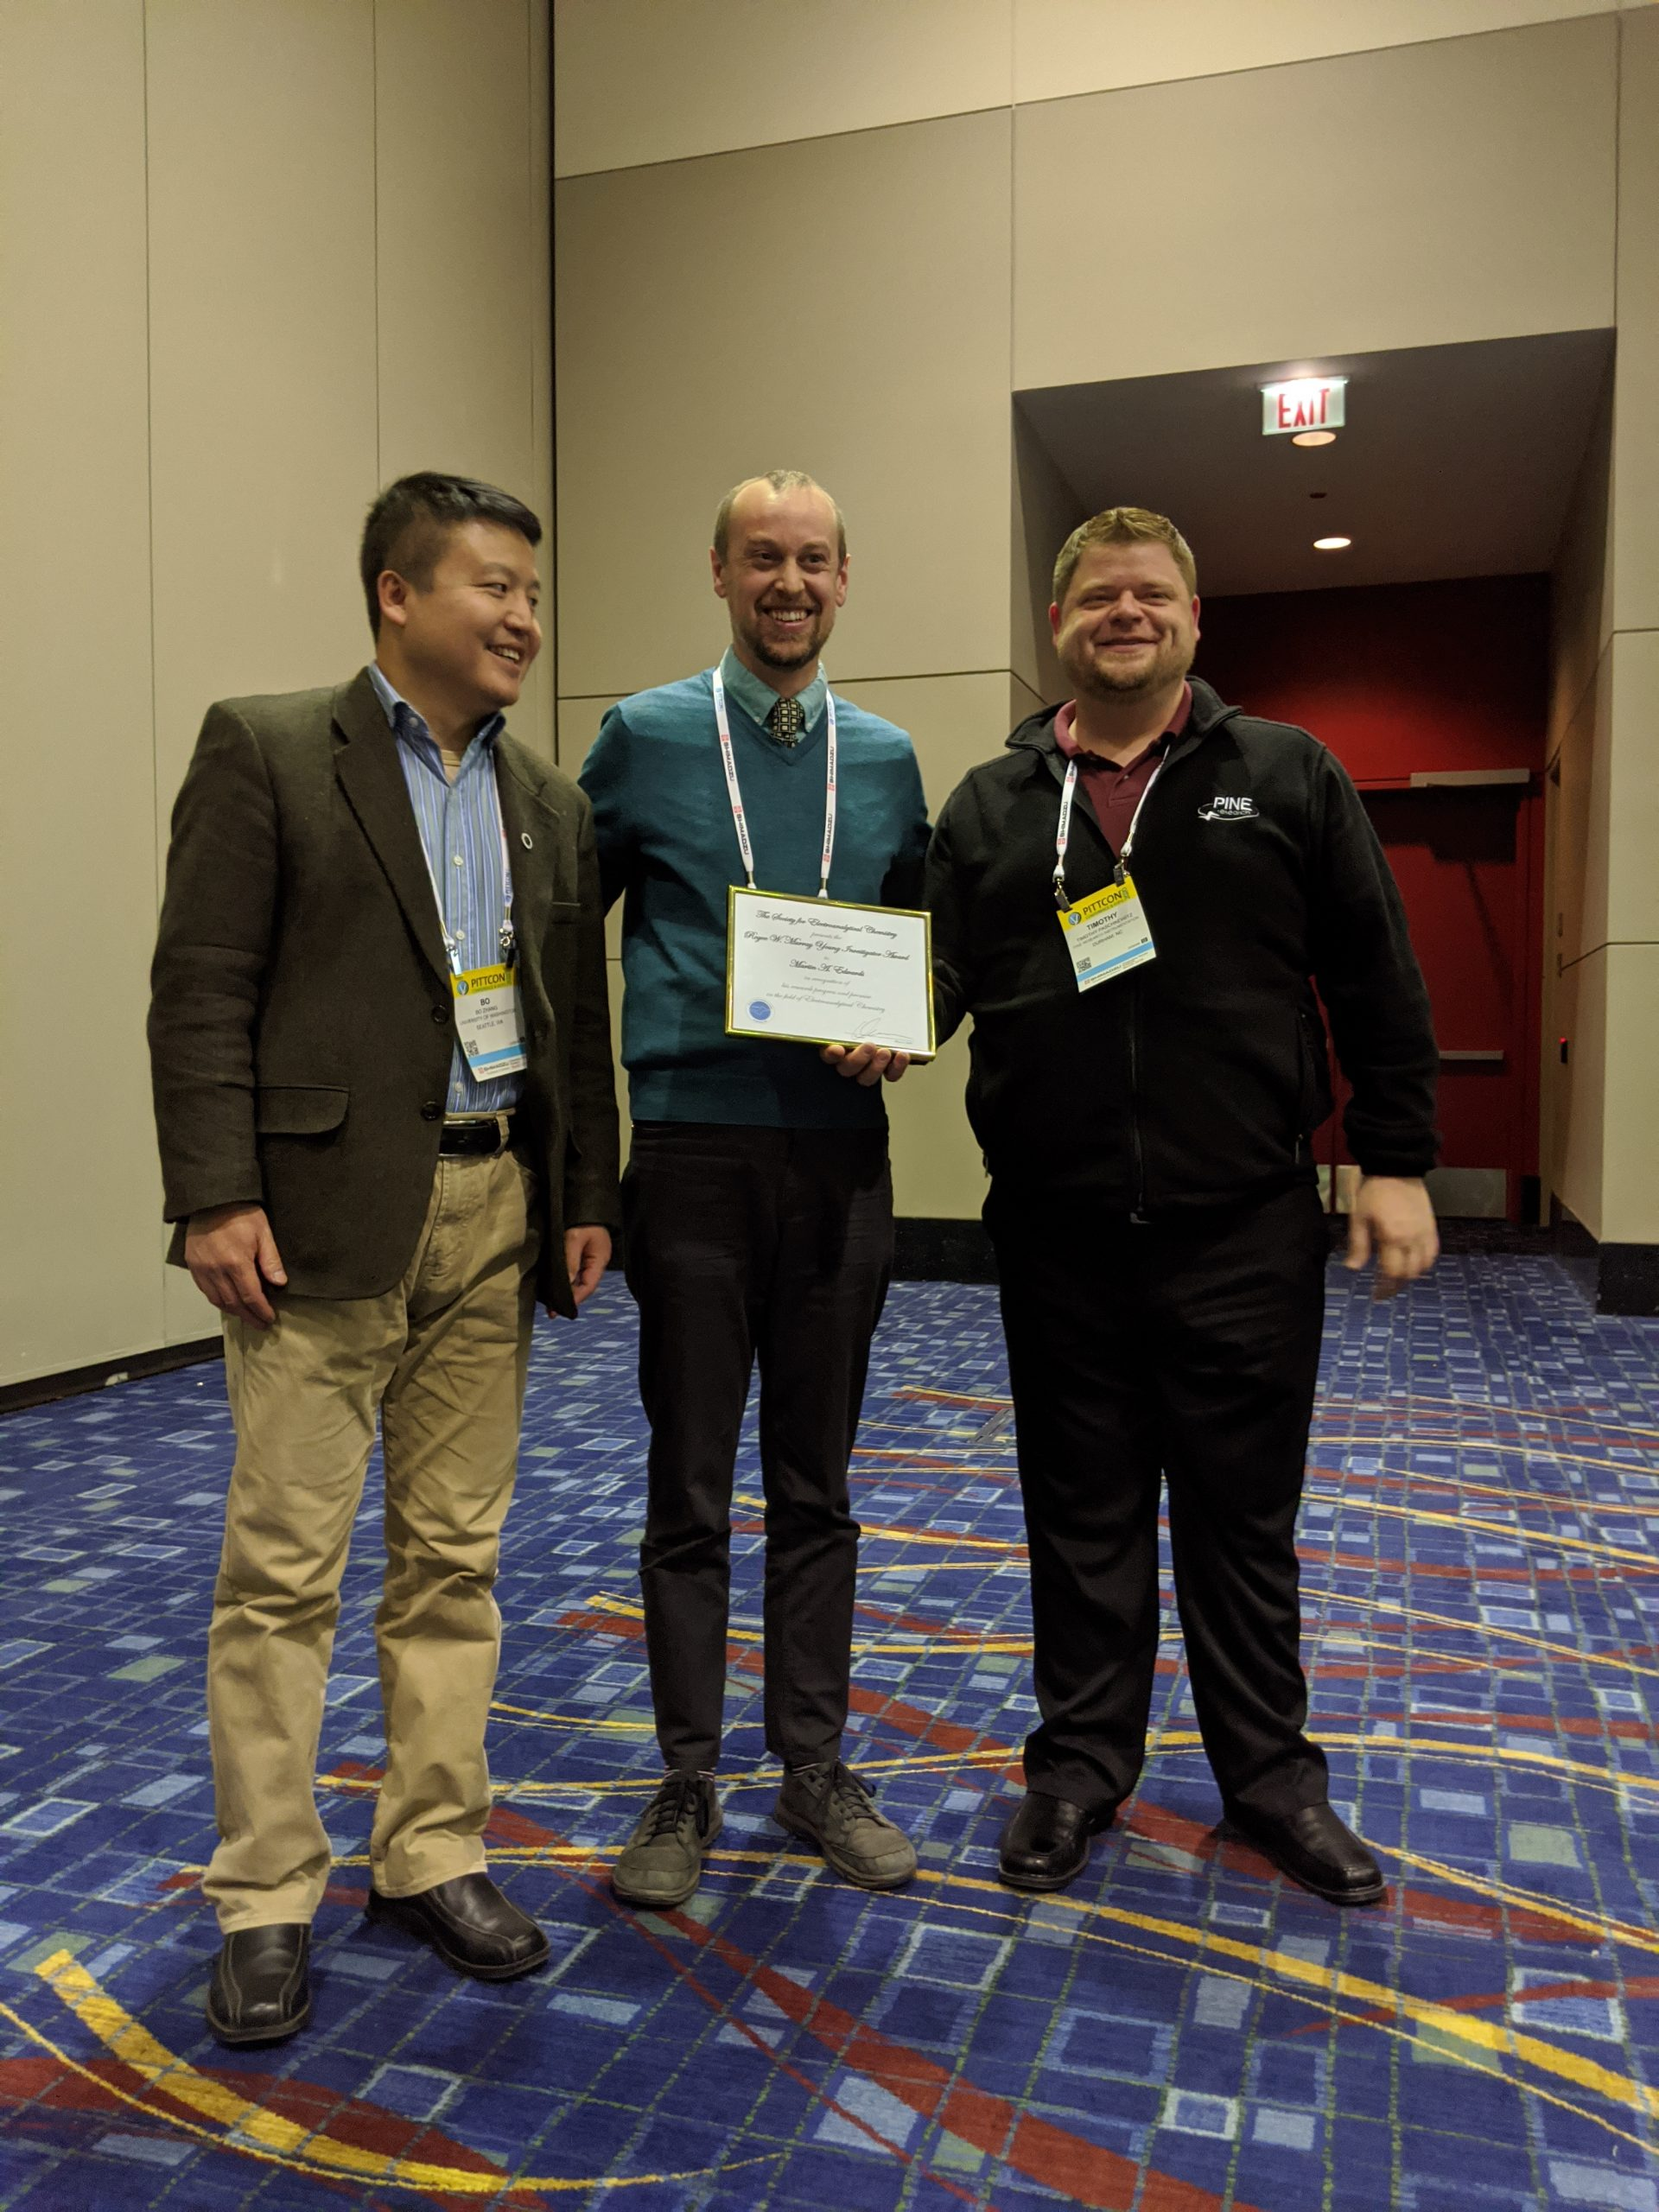 SEAC Award Symposium at Pittcon 2020 (Chicago, IL) – 9